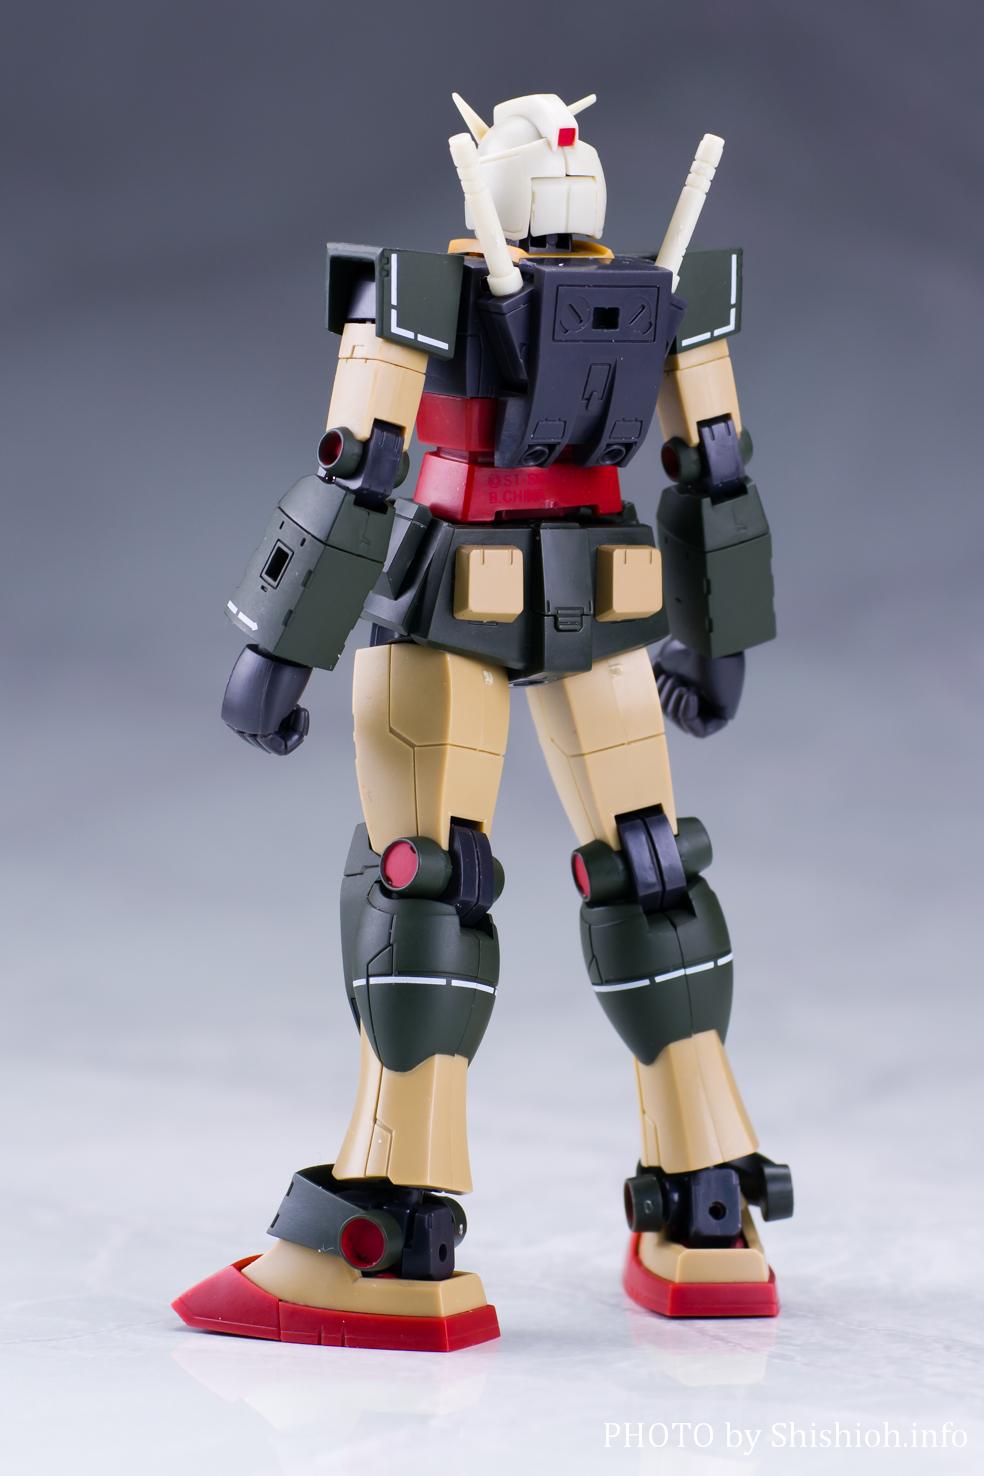 ROBOT魂〈SIDE MS〉RX-78-2 ガンダム ver. A.N.I.M.E.〜劇場ポスター リアルタイプカラー〜